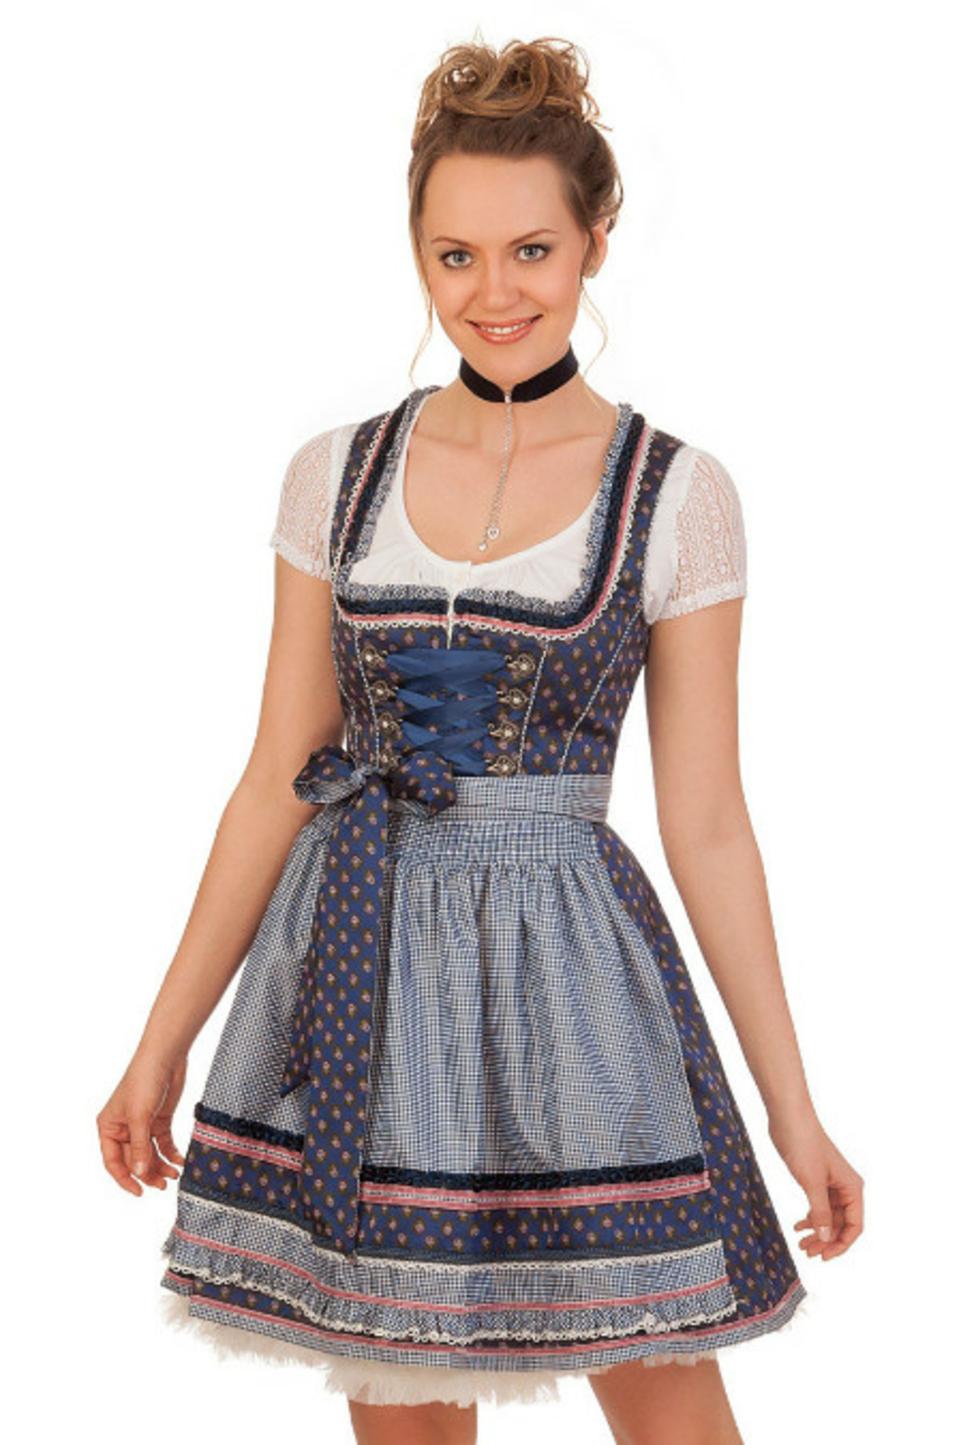 260241bb935e0c Krüger Madl Mini Dirndl 2tlg. - ROSABELLA - blau online kaufen, Minidirndl